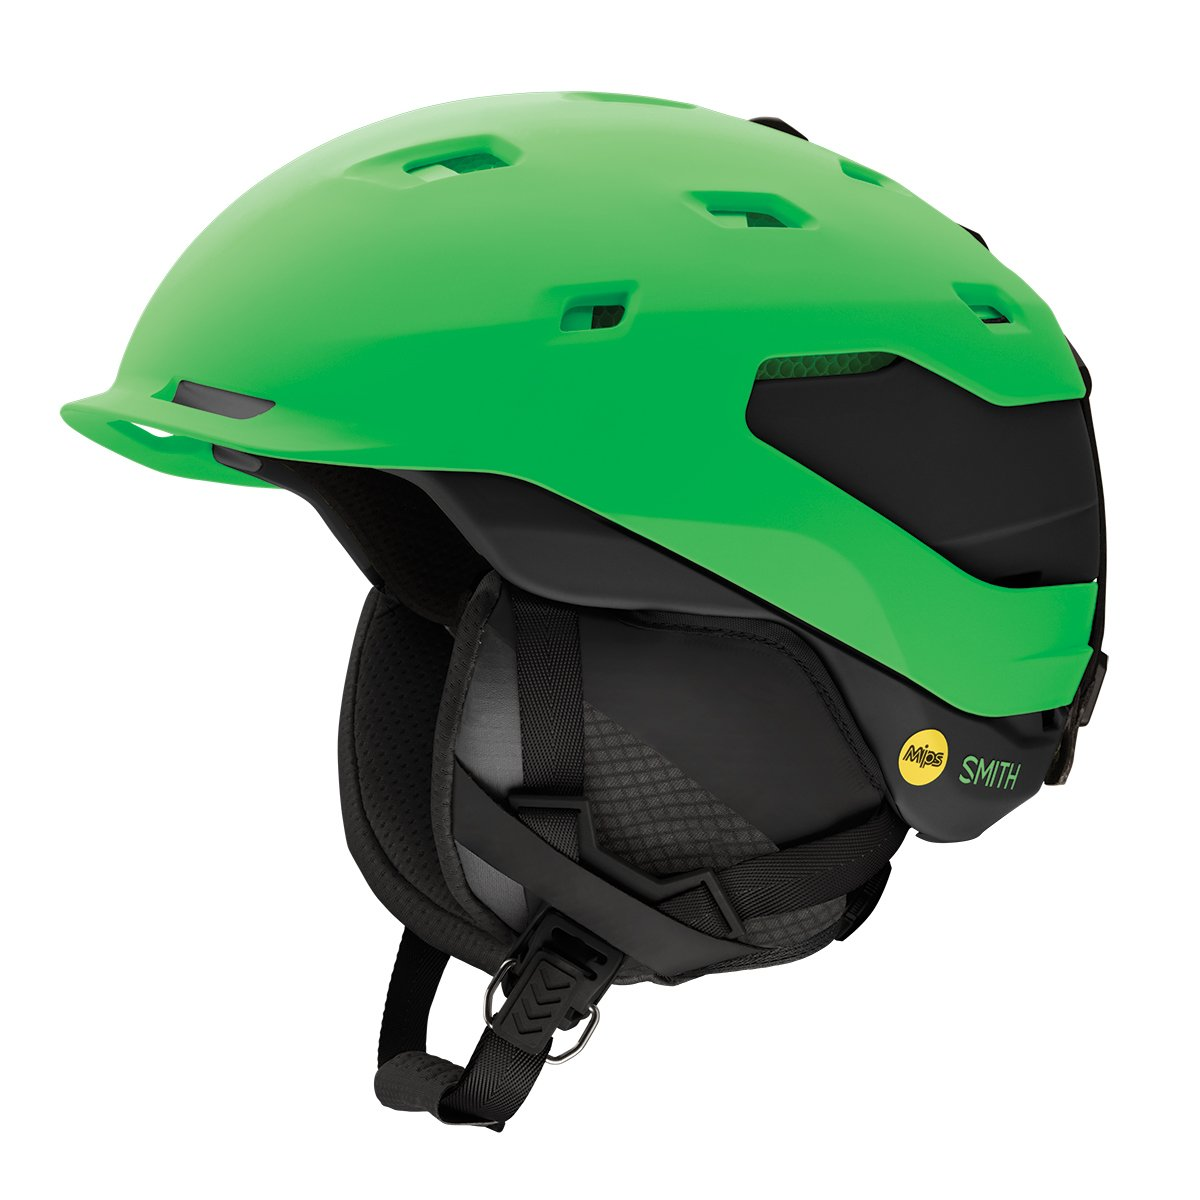 Smith Quantum Mips Snow Helmet - Matte Reactor Black (Medium) by Smith Optics